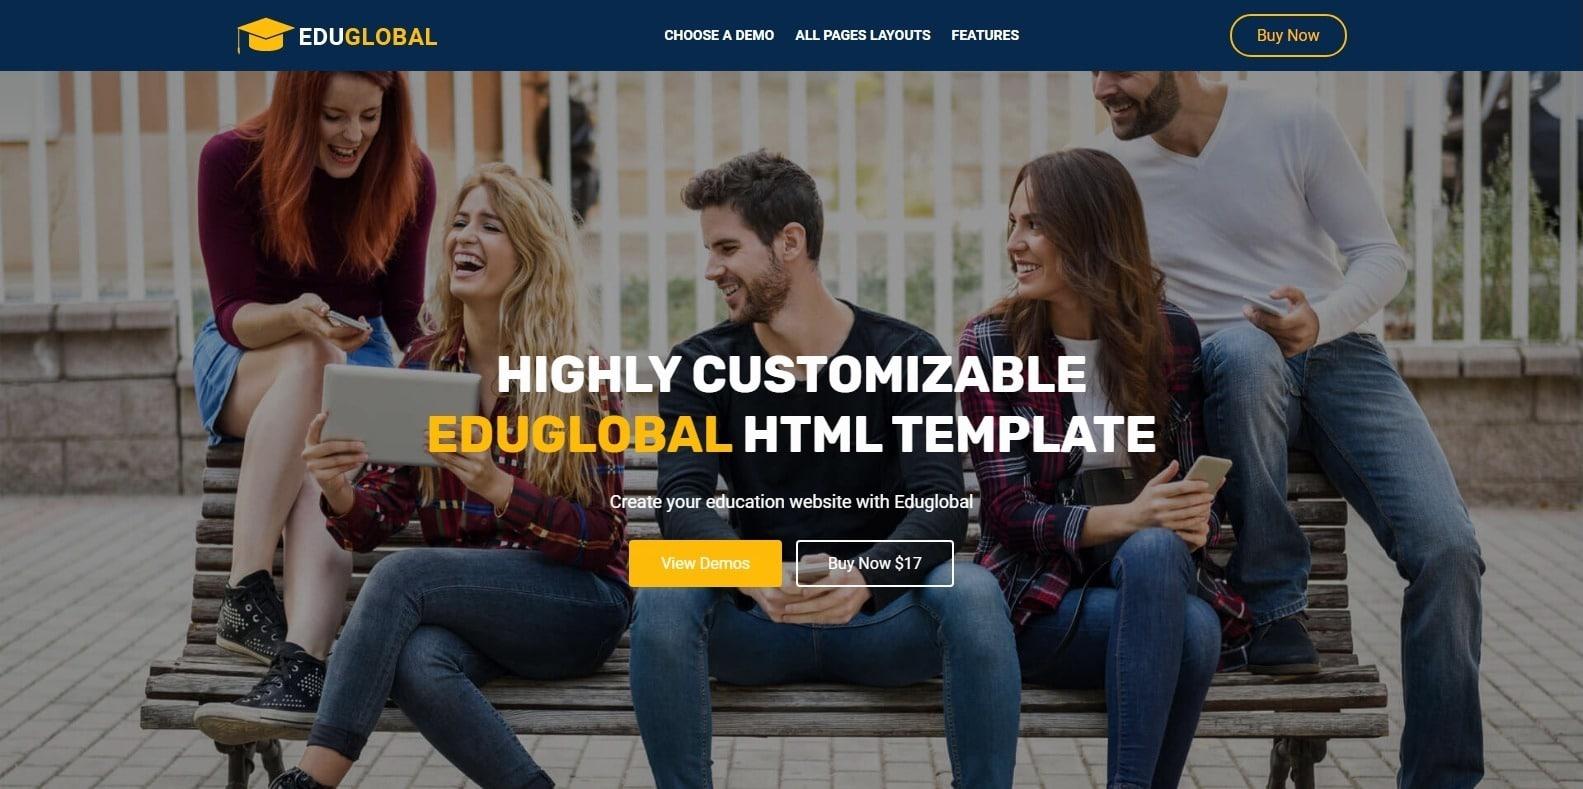 eduglobal-education-website-template